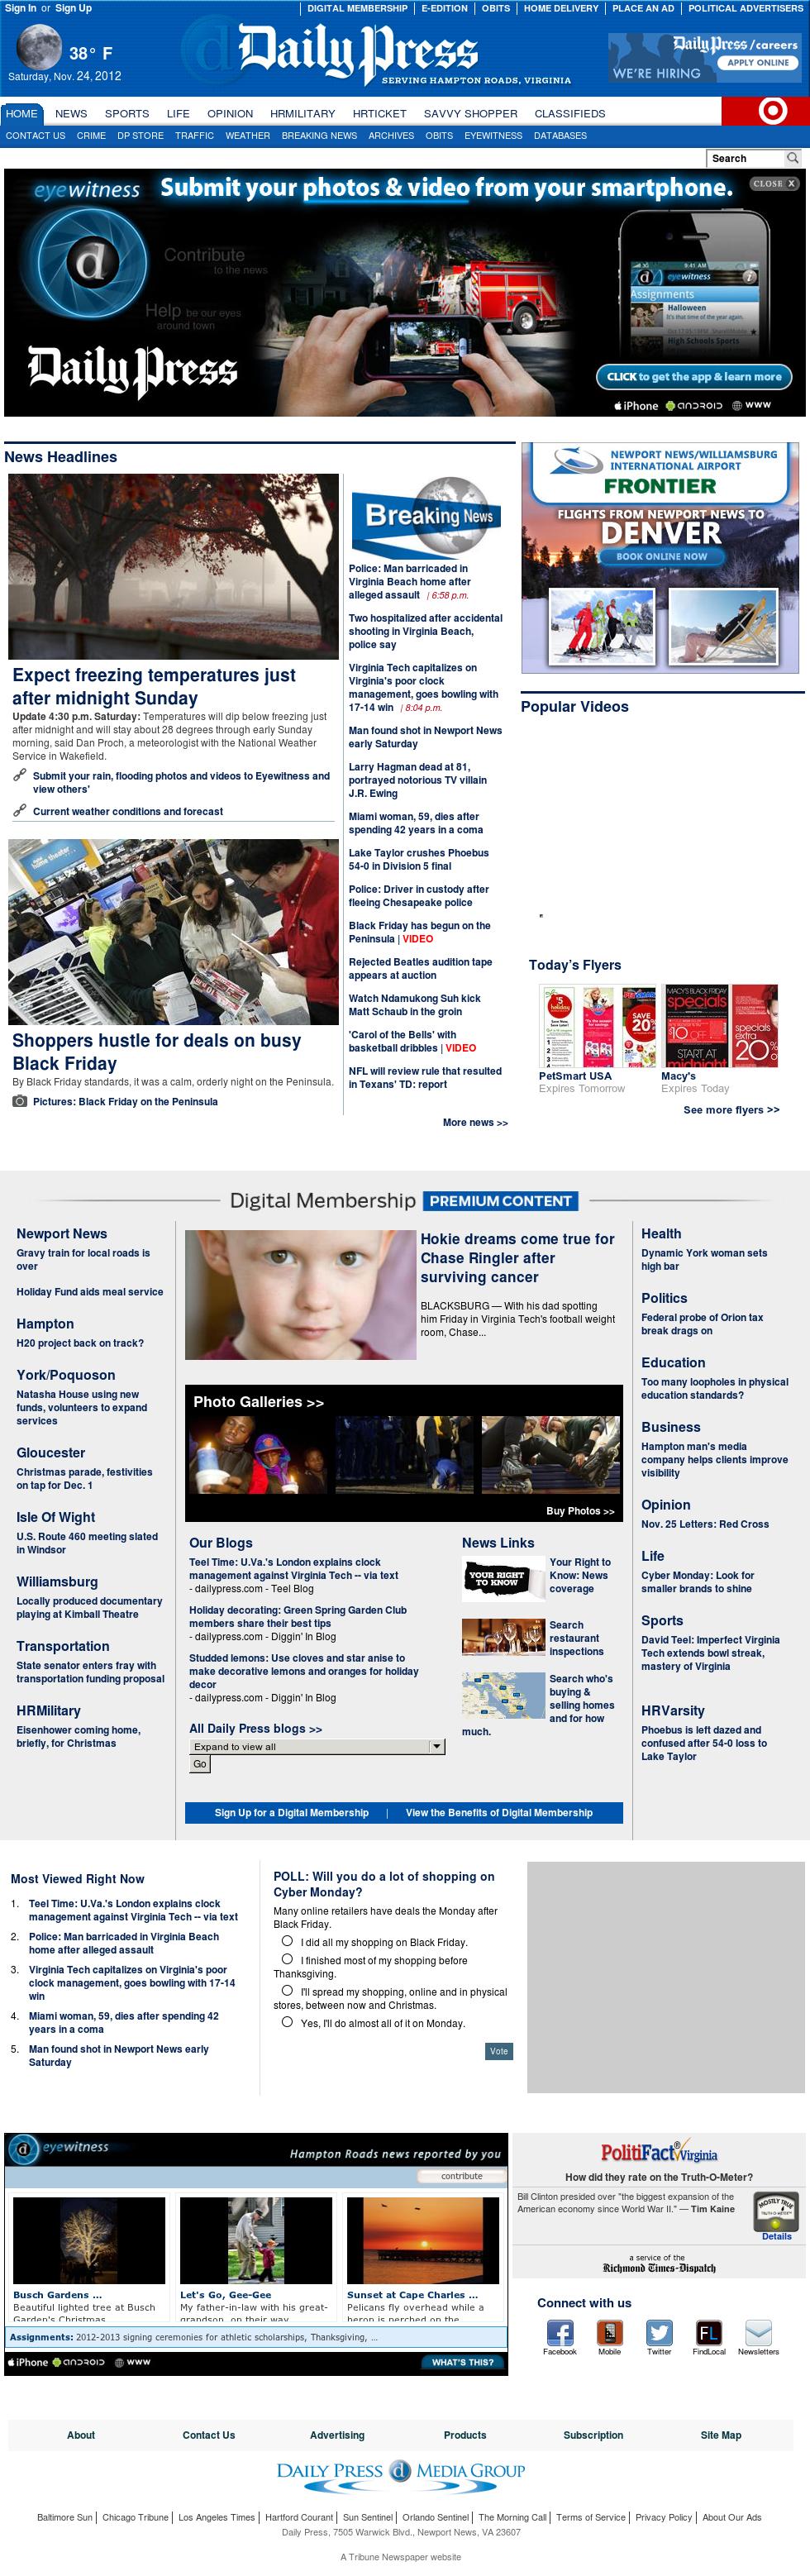 (Hampton Roads) Daily Press at Sunday Nov. 25, 2012, 2:05 a.m. UTC